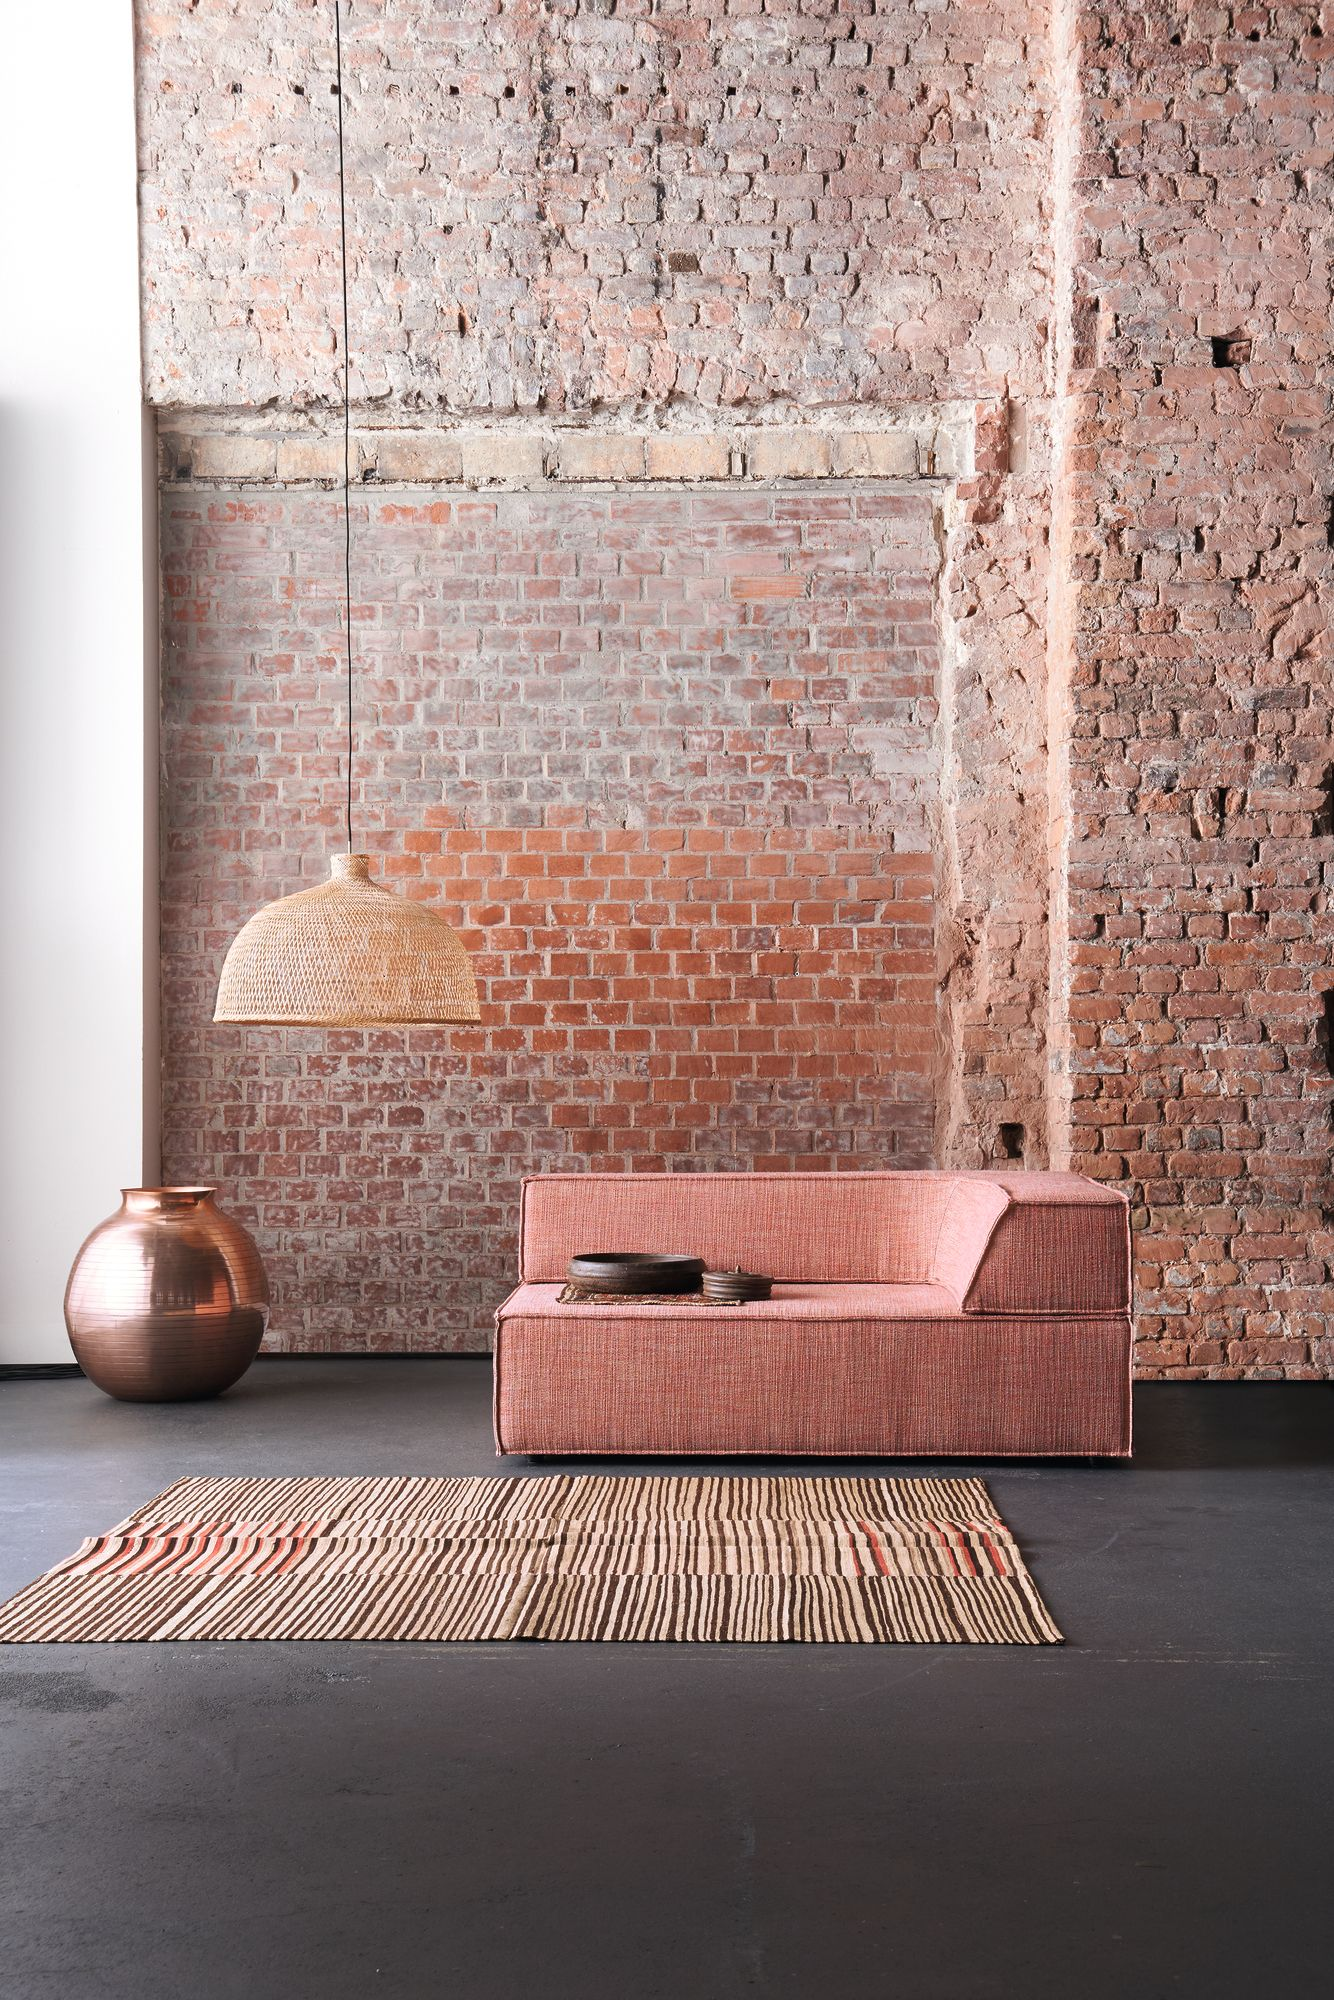 Corner sectional fabric armchair TRIO by @corsitzmoebel